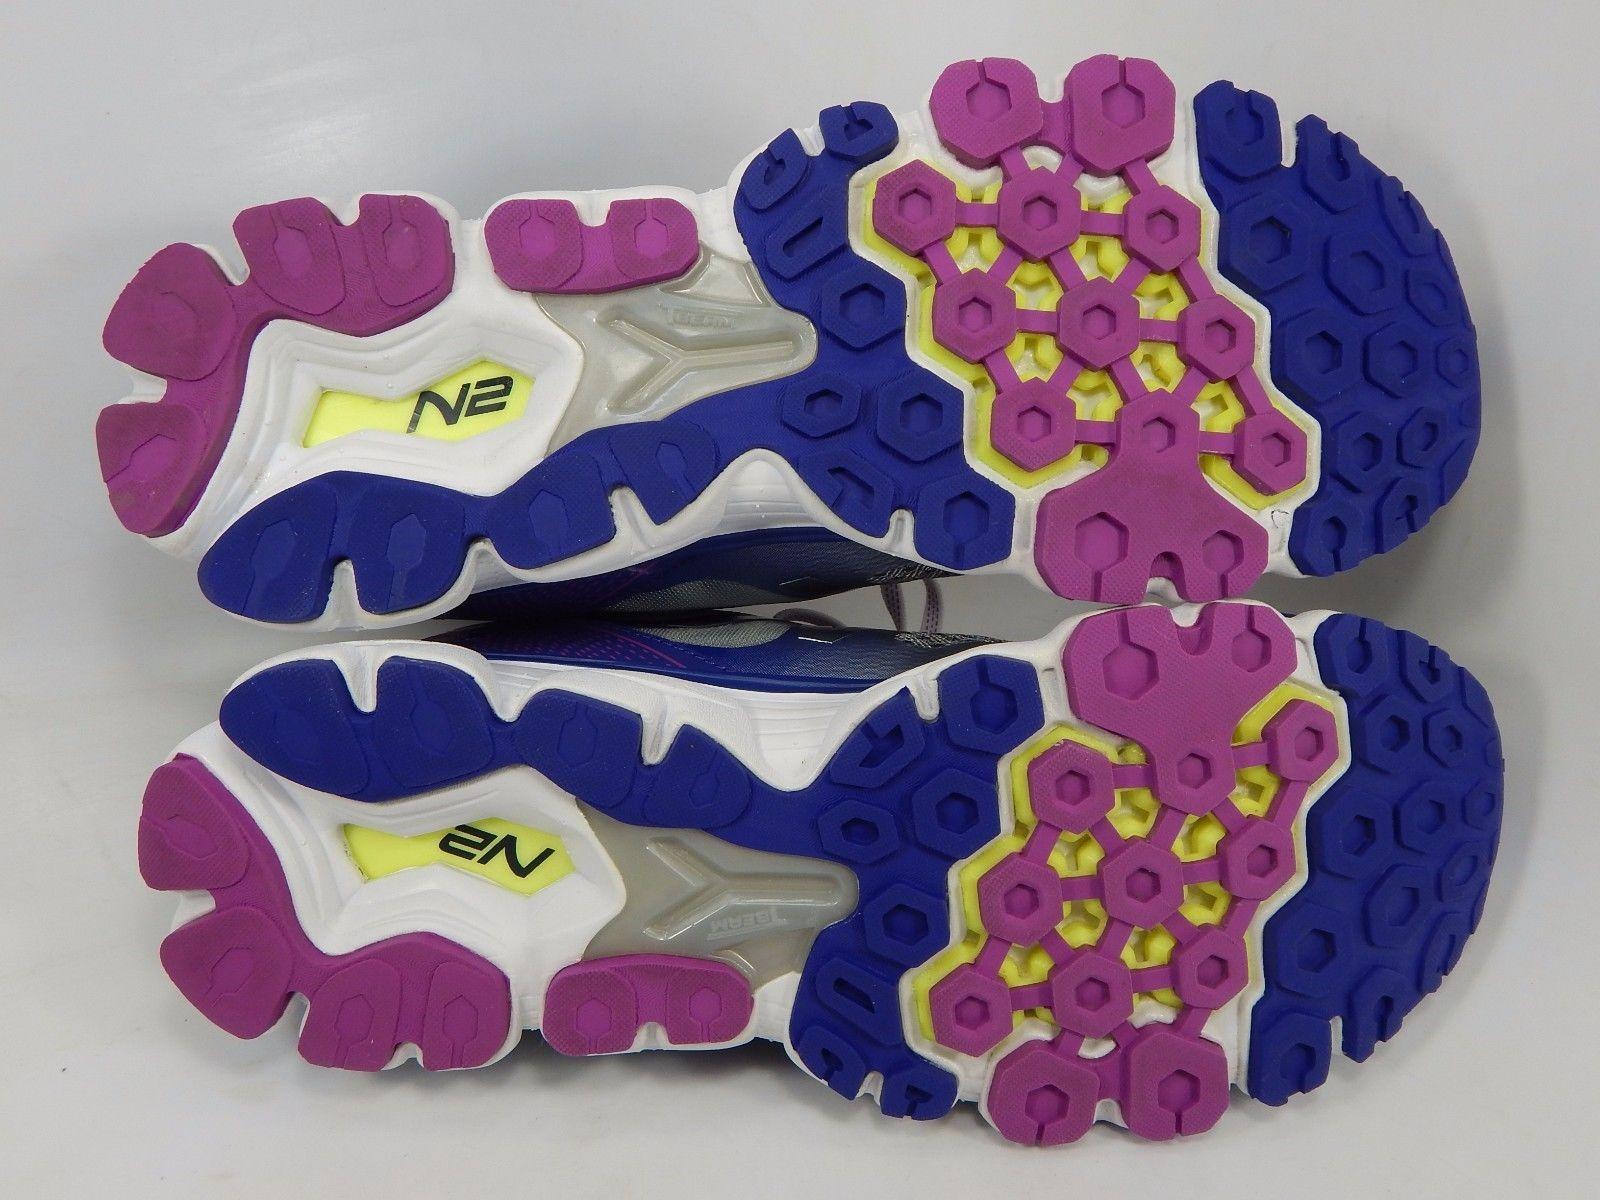 New Balance 1080 v5 Women's Running Shoes Size US 12 M (B) EU 44 Silver W1080SP5